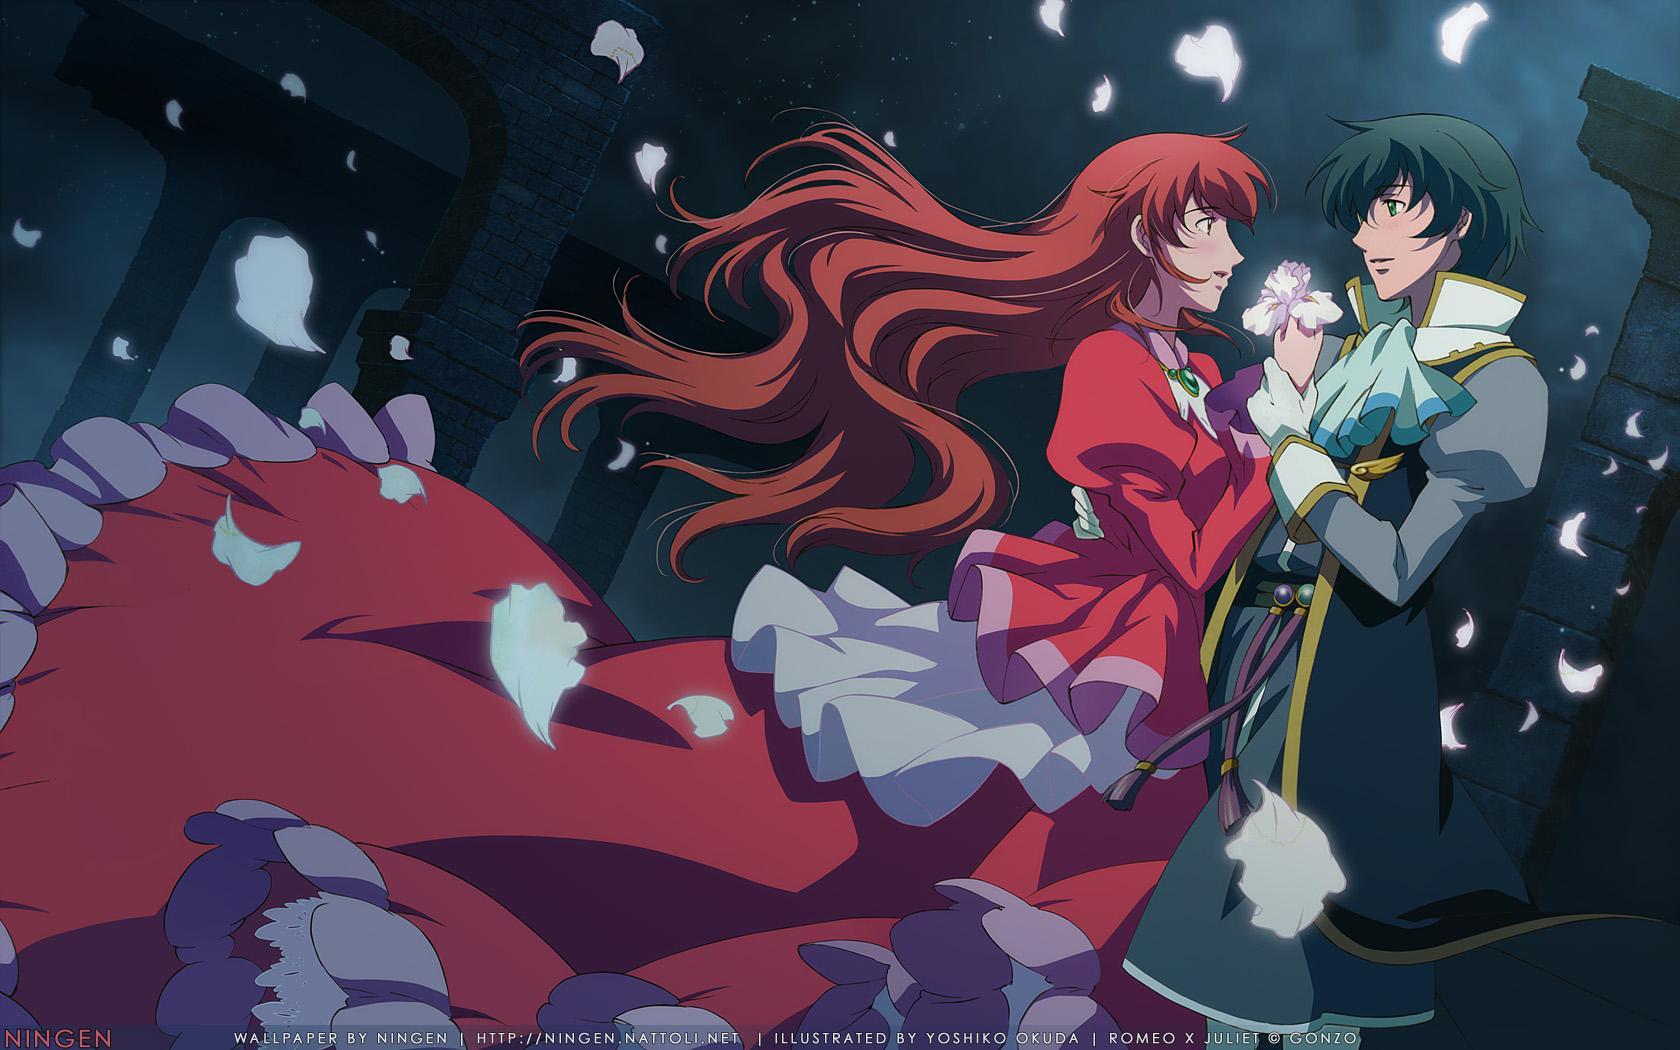 Romantic anime like mahoutsukai no yome Romeo x Juliet